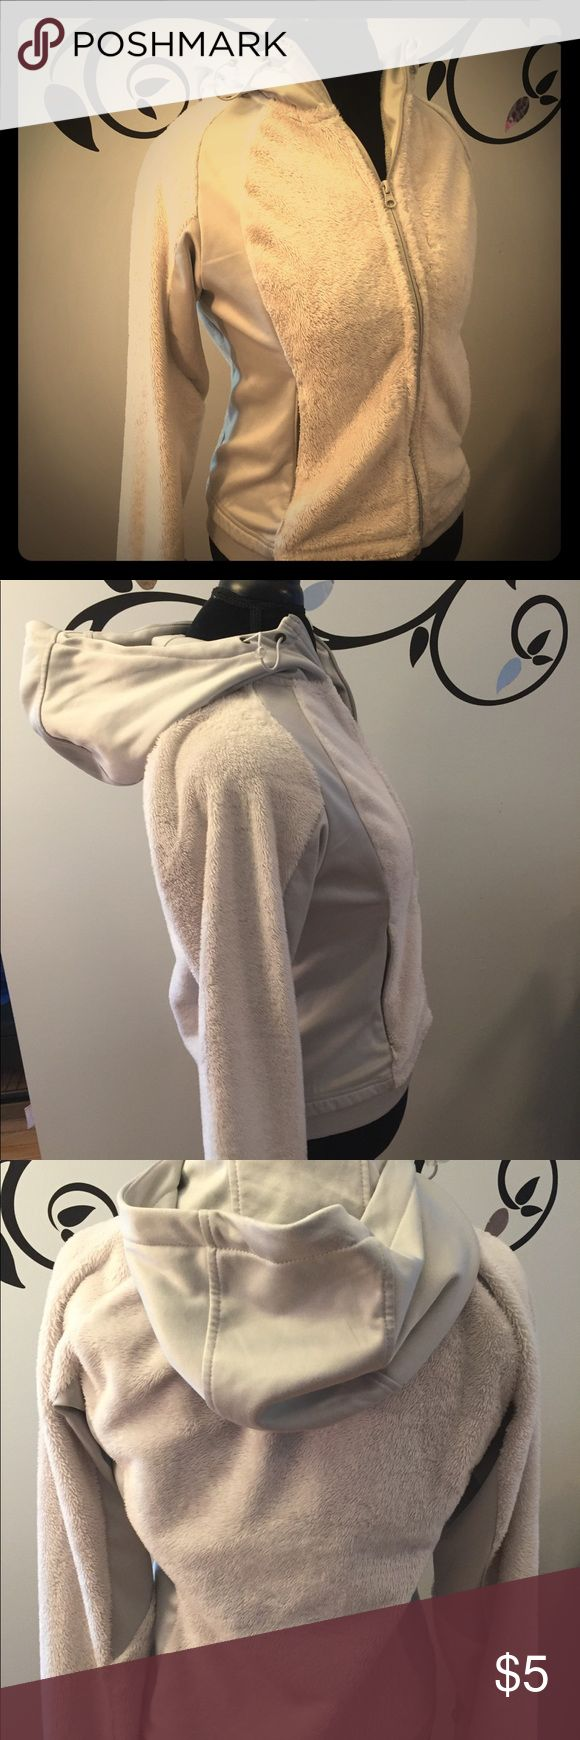 🌈🆕EUC Canyon Creek Gray & Silver Zip Hoodie Coat 🌈🆕EUC Canyon Creek Gray & Silver Zip Jacket. Zip up jacket has a combination of fuzzy fleece and stretchy tech fabric. Nice sized hood. Women's size Small. Great for jogging. Canyon Creek Tops Sweatshirts & Hoodies